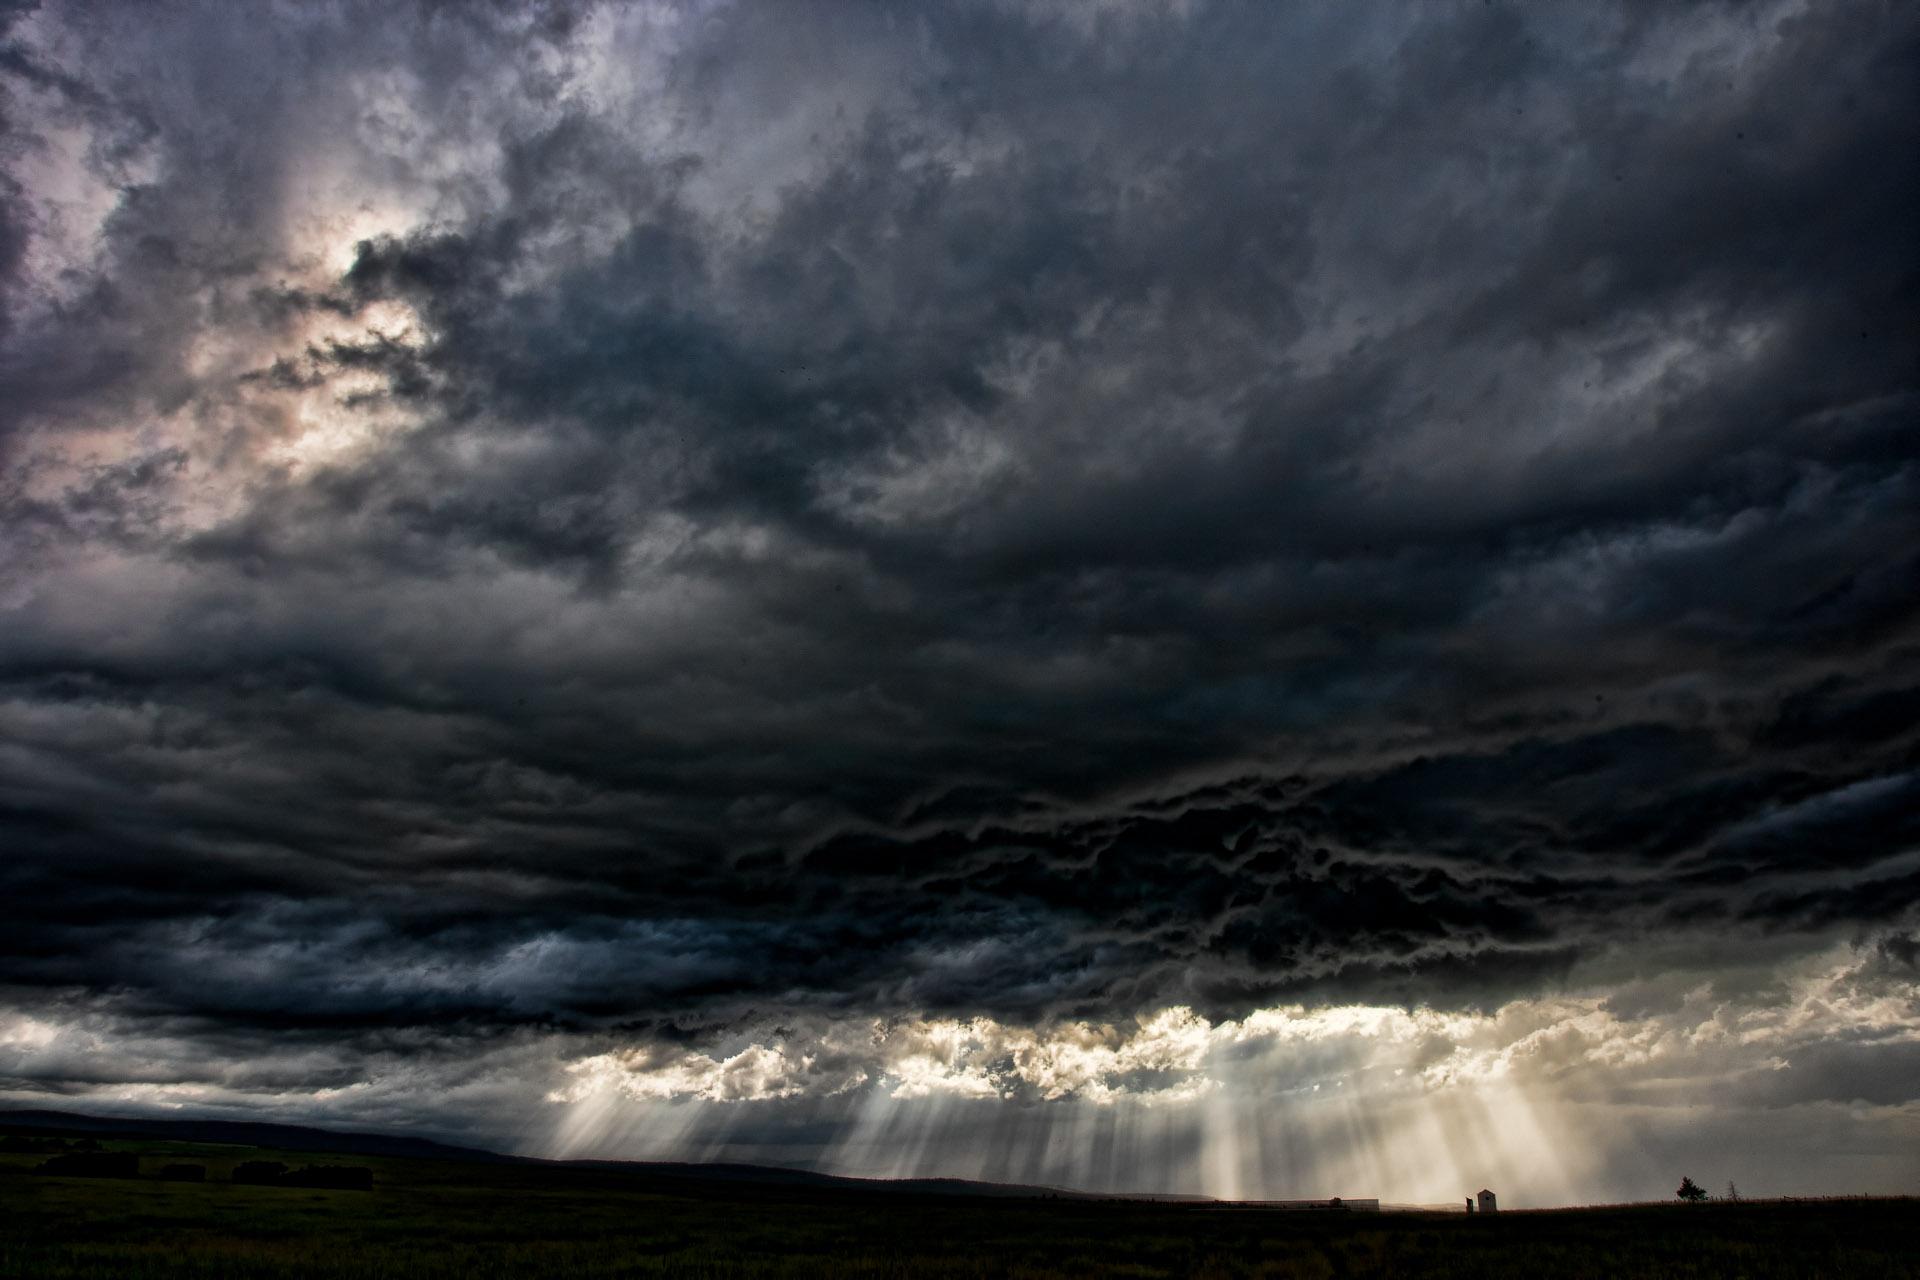 Free Download Dark Storm With Dark Clouds Sky Wallpapers Hi